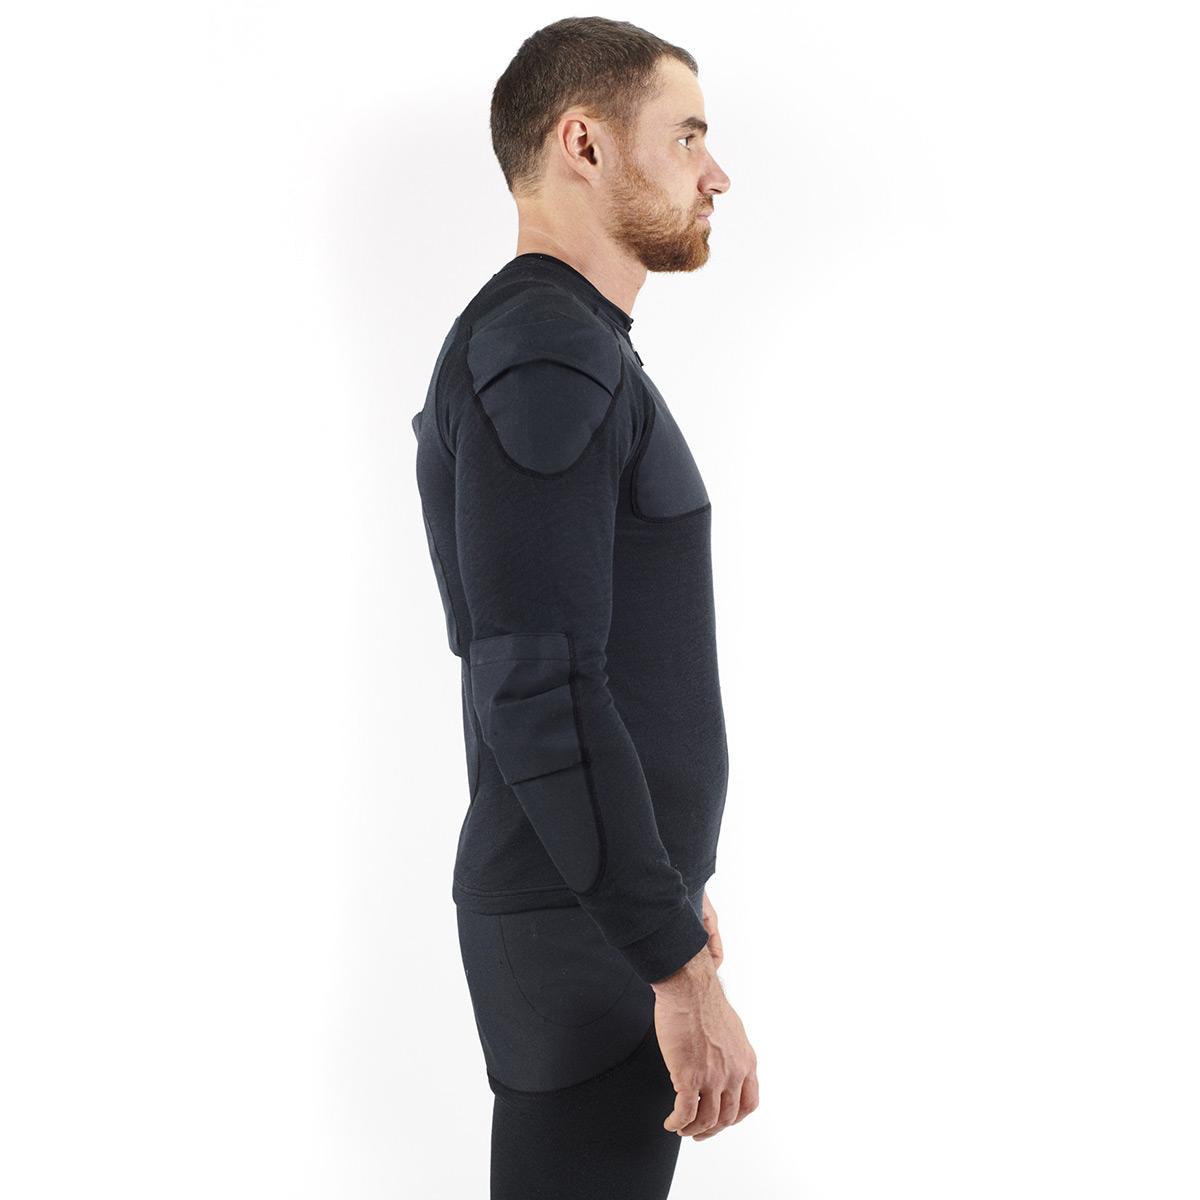 Bowtex Standard Shirt - Black